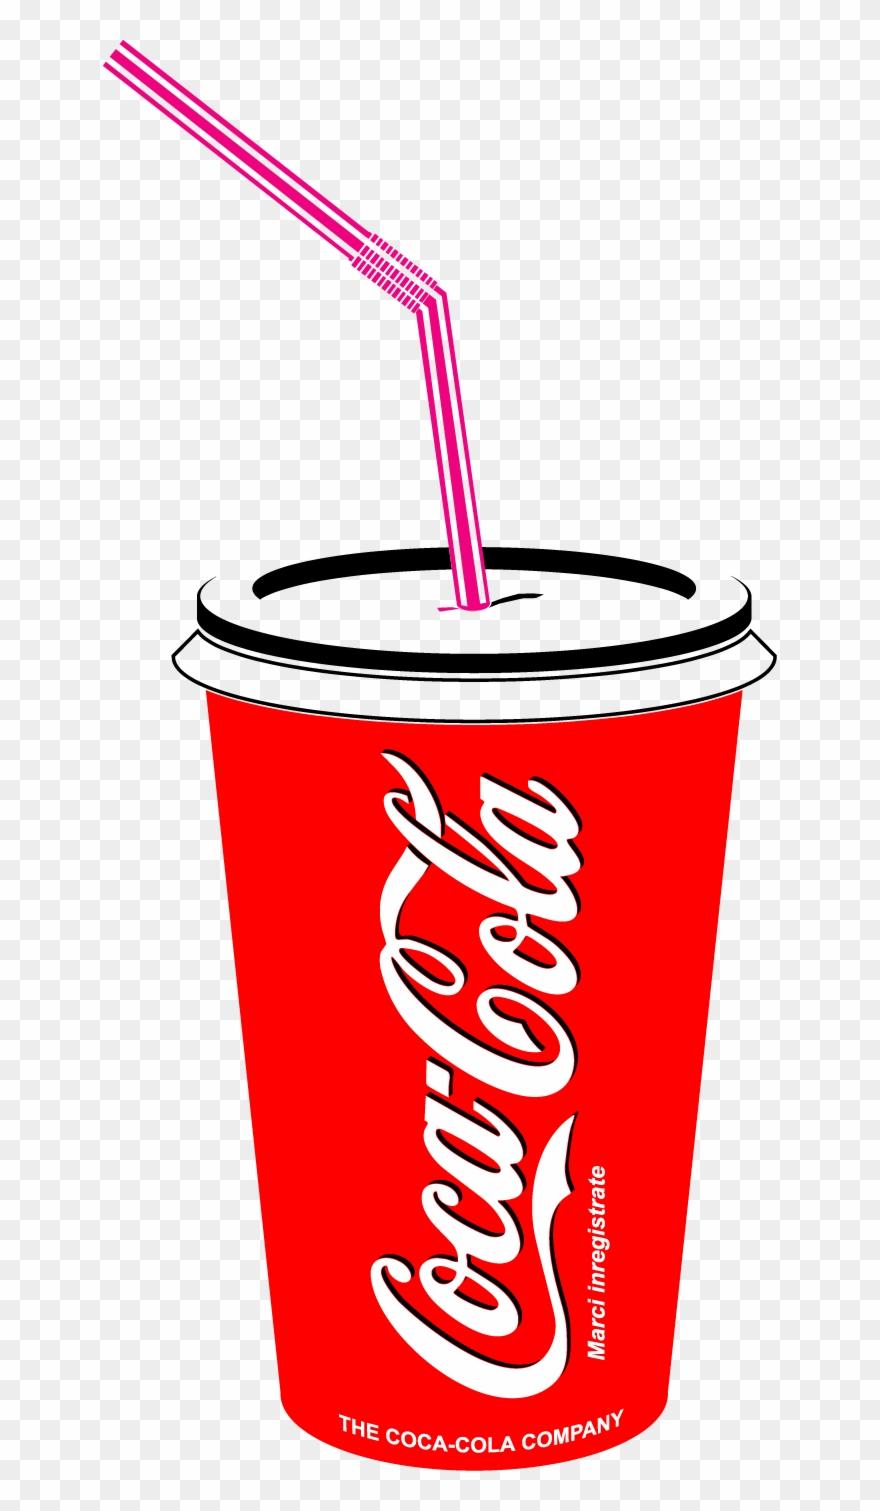 Coca cola clipart clip stock Coke Clipart Coke Cup - Coca Cola Illustration Png Transparent Png ... clip stock